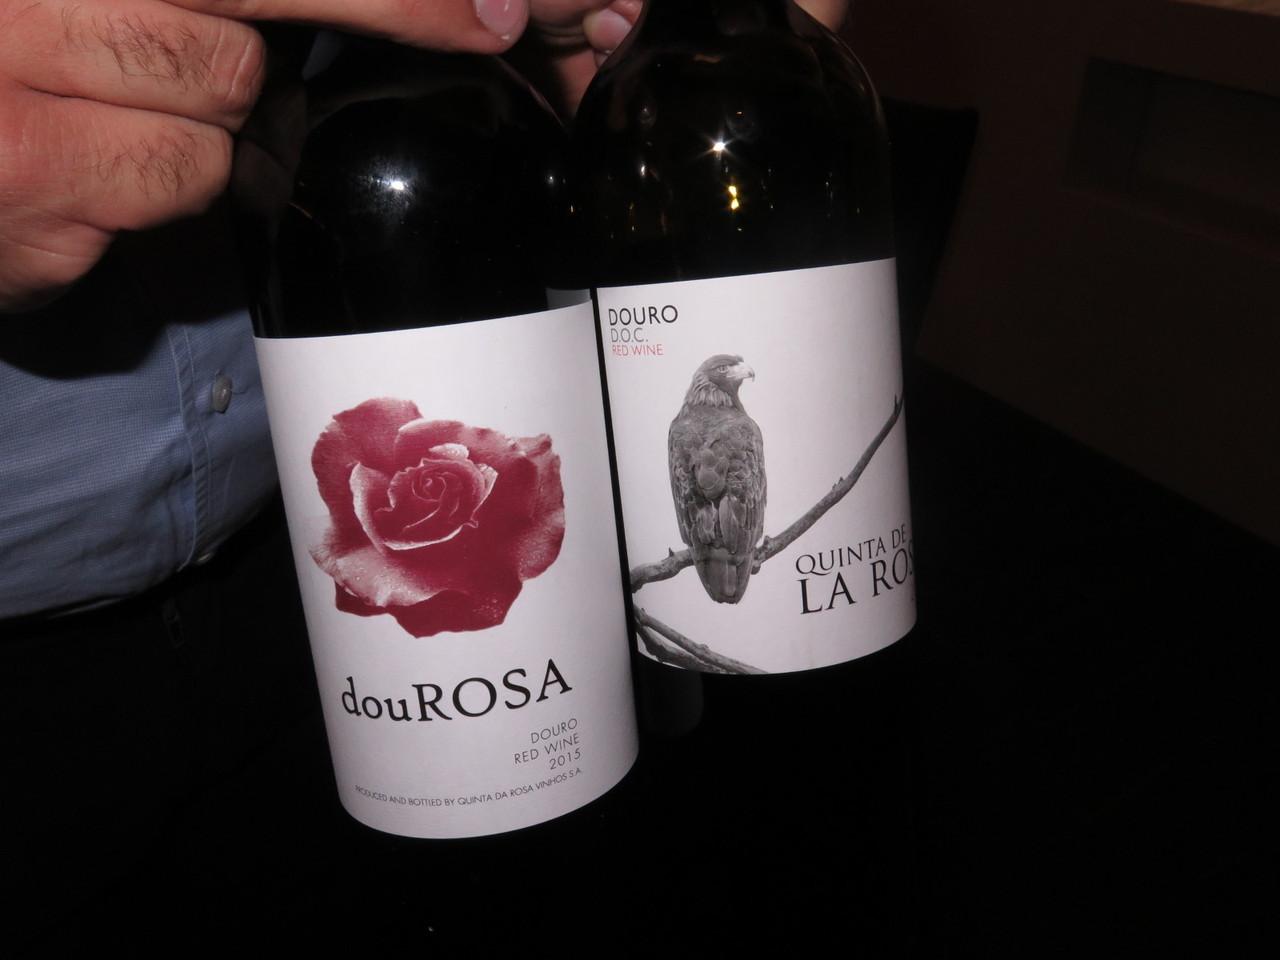 DouRosa vs. La Rosa